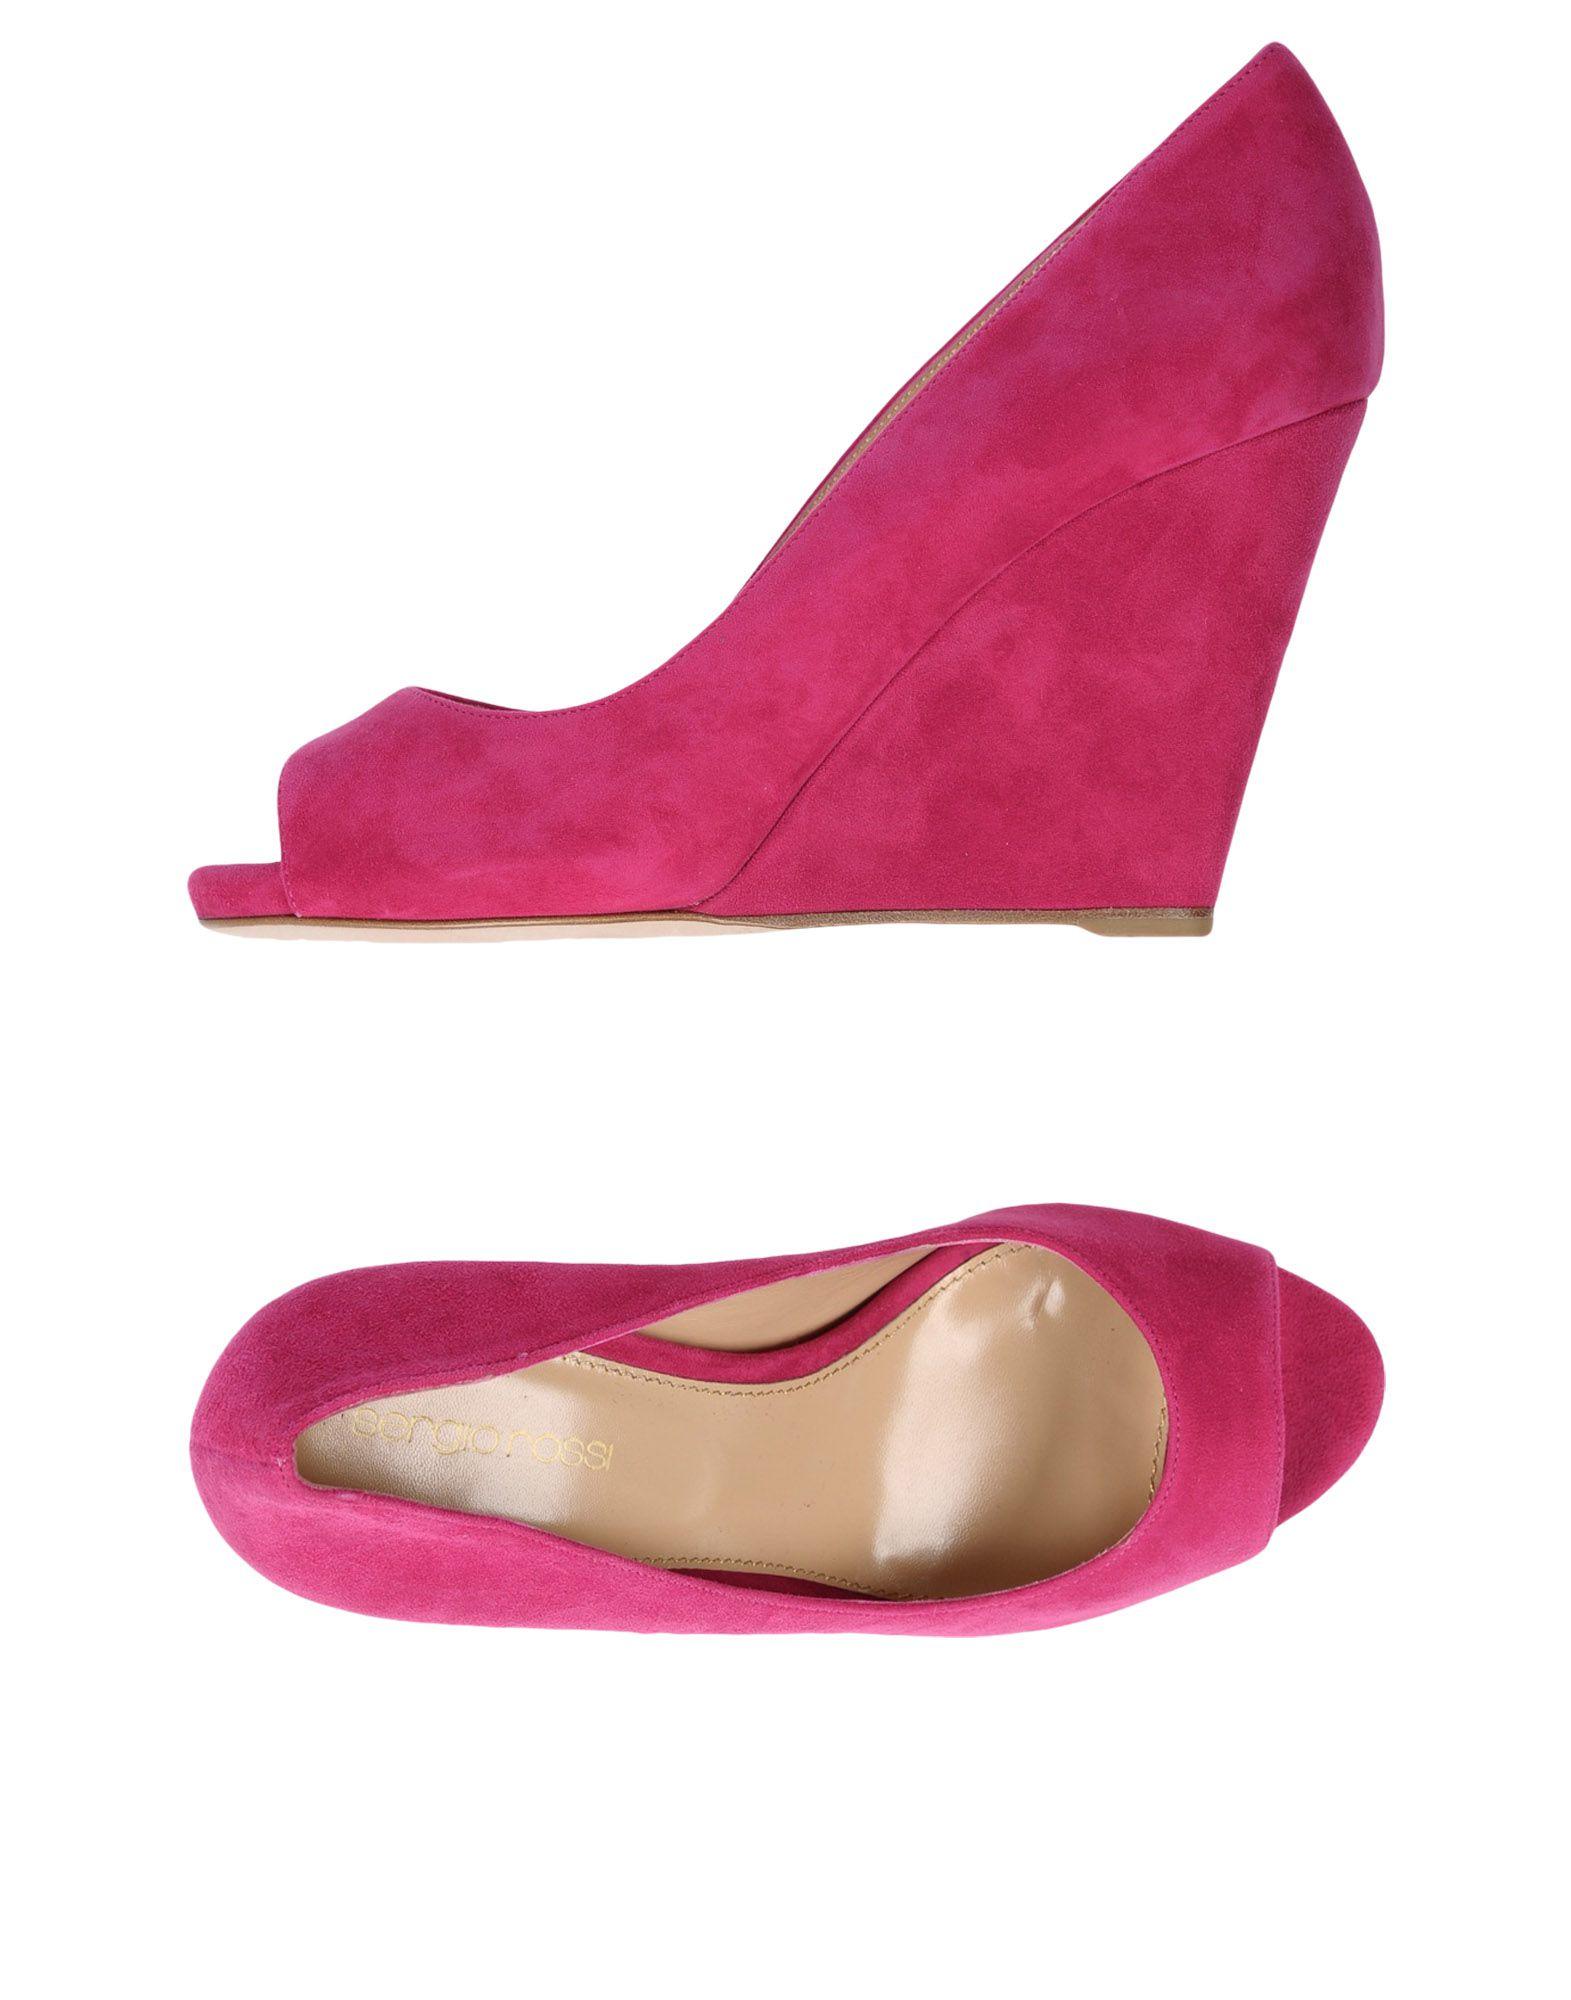 Stilvolle billige Schuhe Sergio Rossi Pumps Pumps Pumps Damen  11432213PF 196524